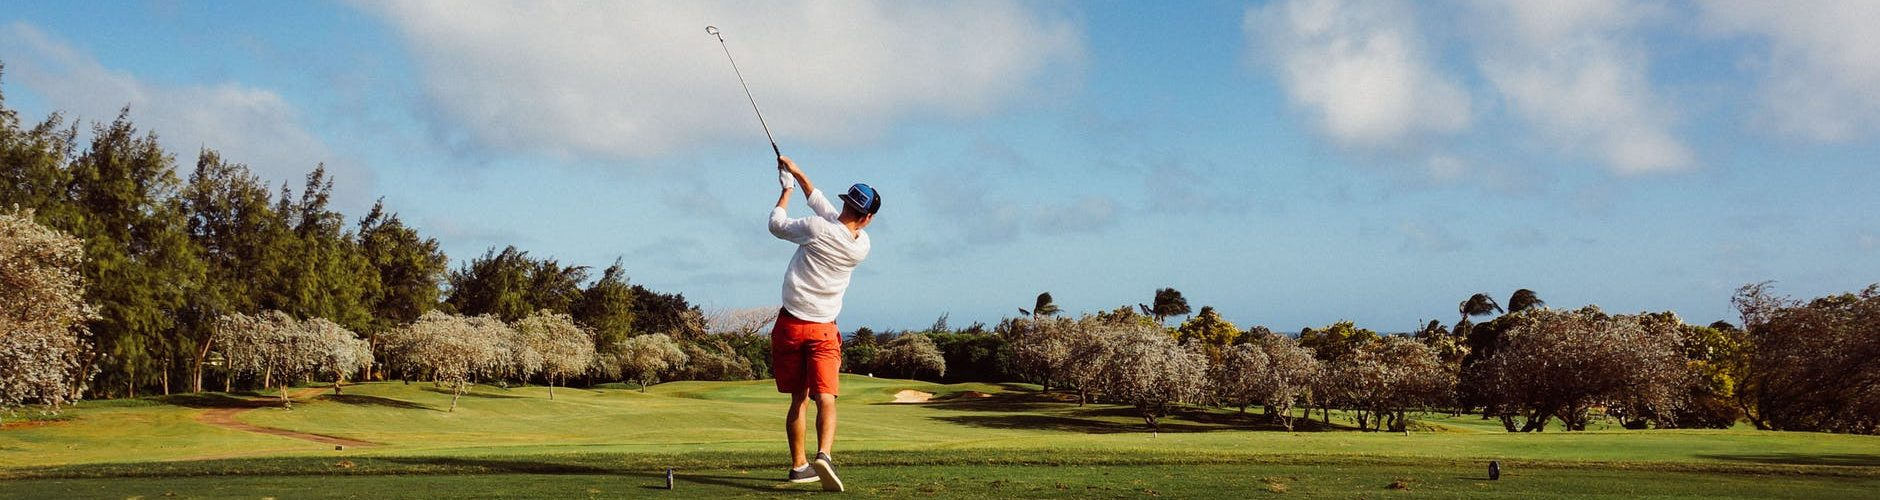 clouds shade golf golfer